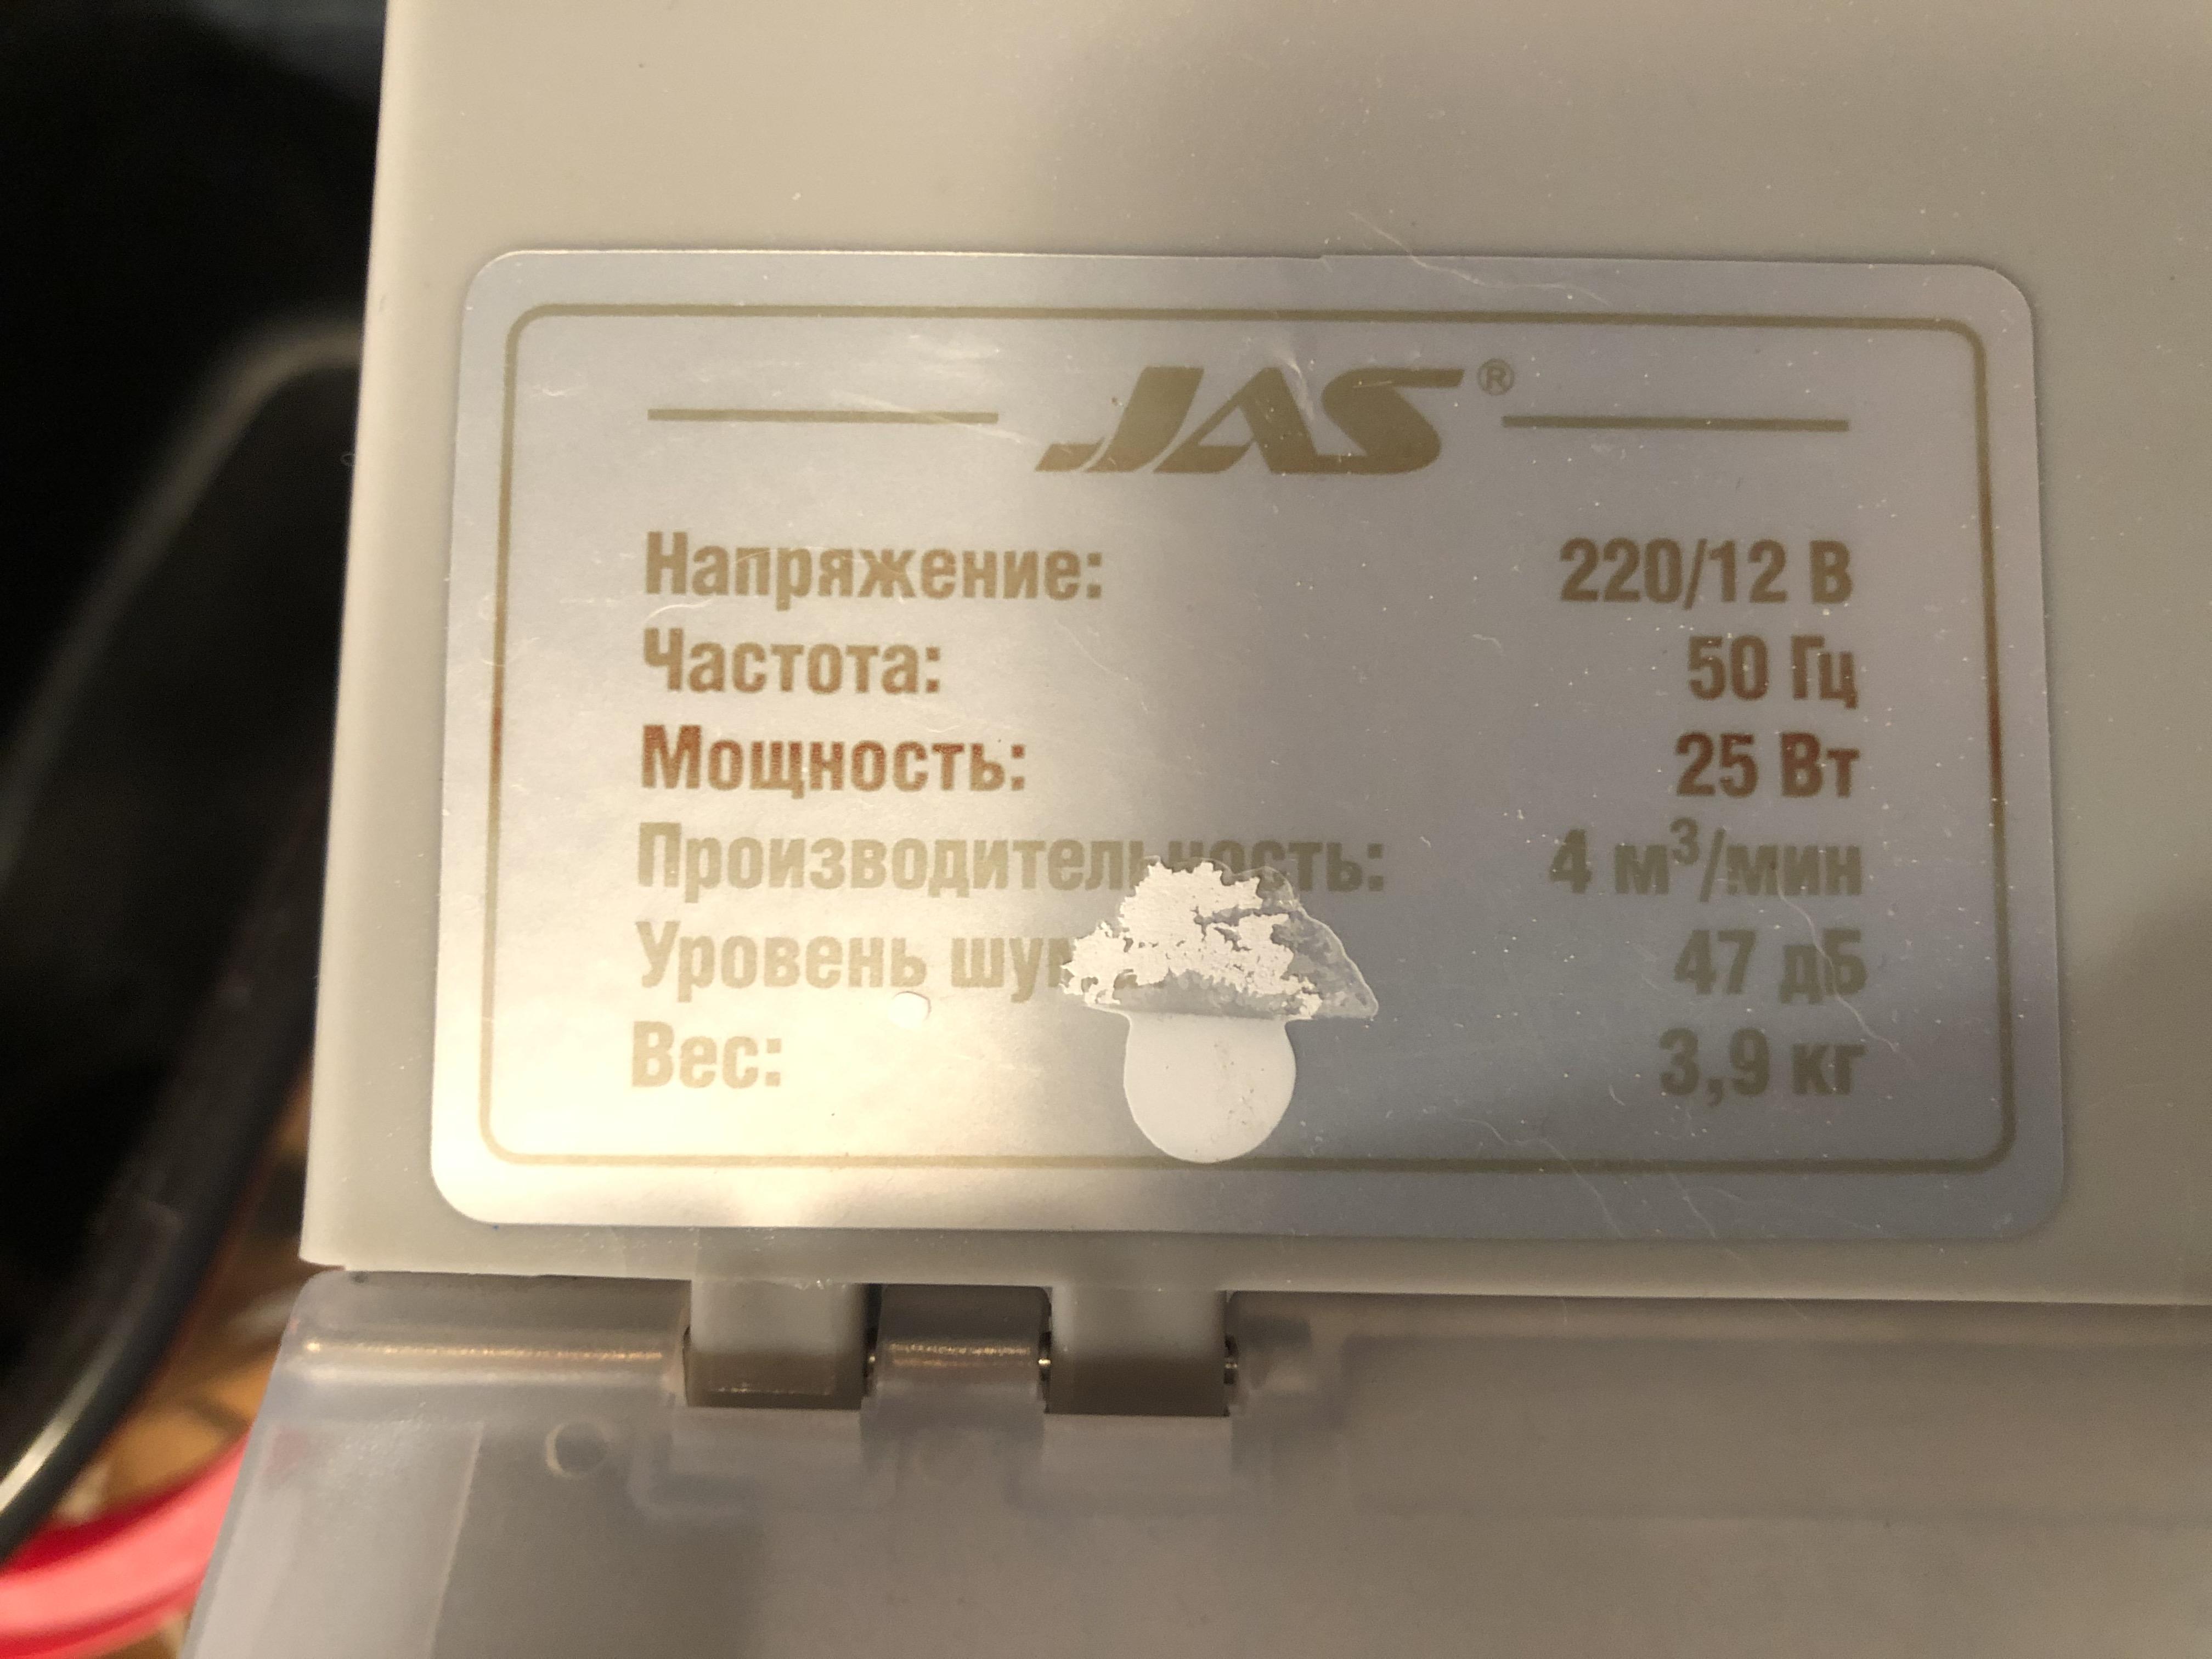 https://images.vfl.ru/ii/1591298773/75b79dc9/30721229.jpg